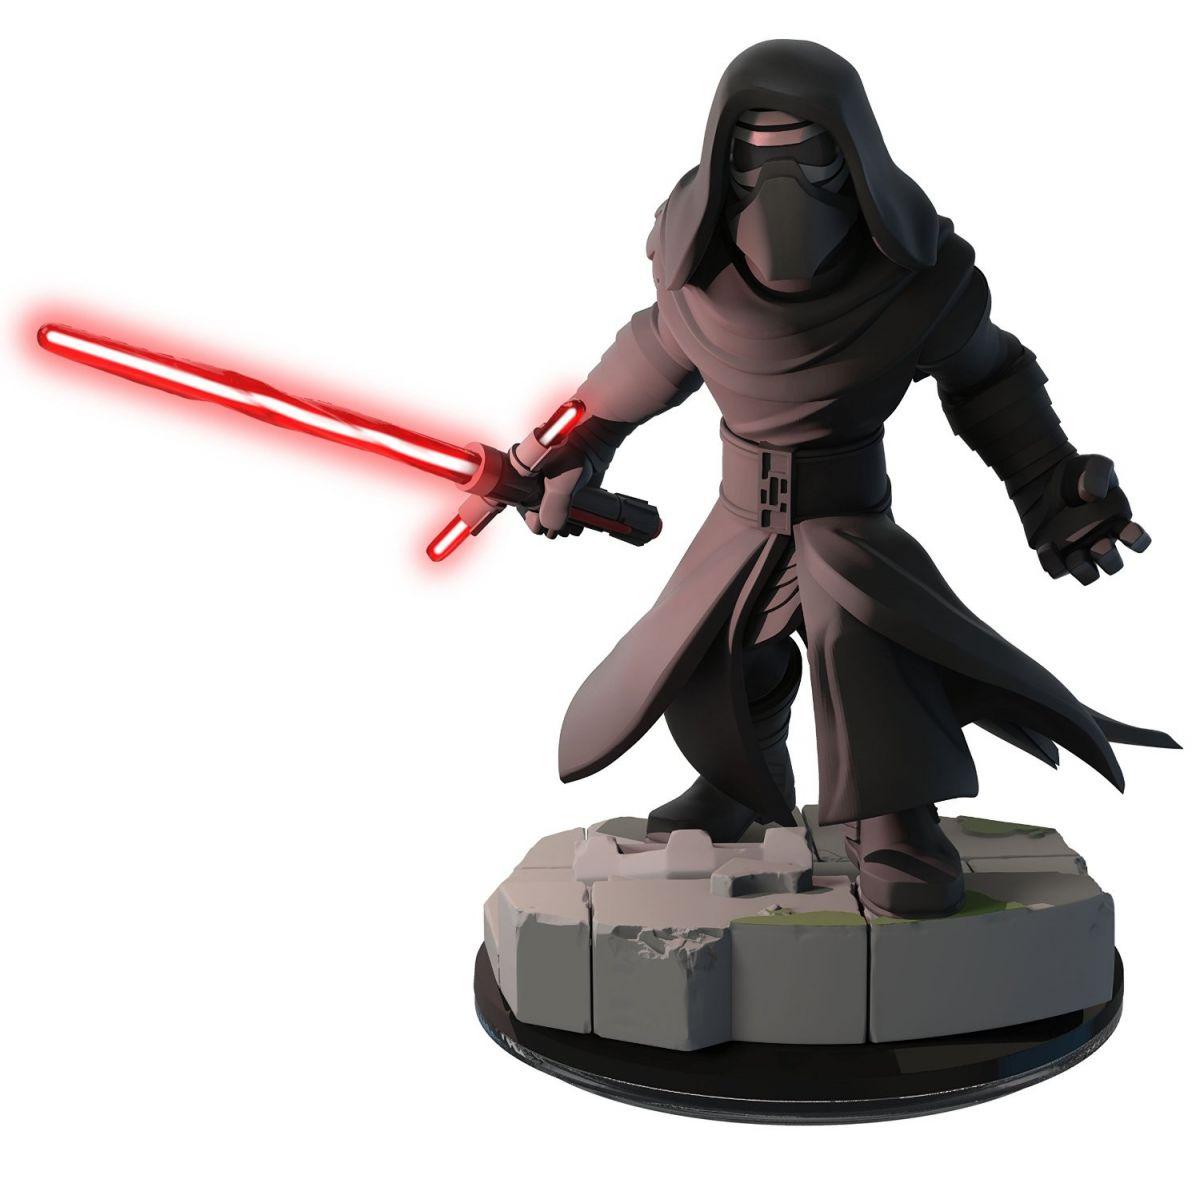 Disney Infinity 3.0 : Star Wars Kylo Ren Light Fx Figure  - Movie Freaks Collectibles